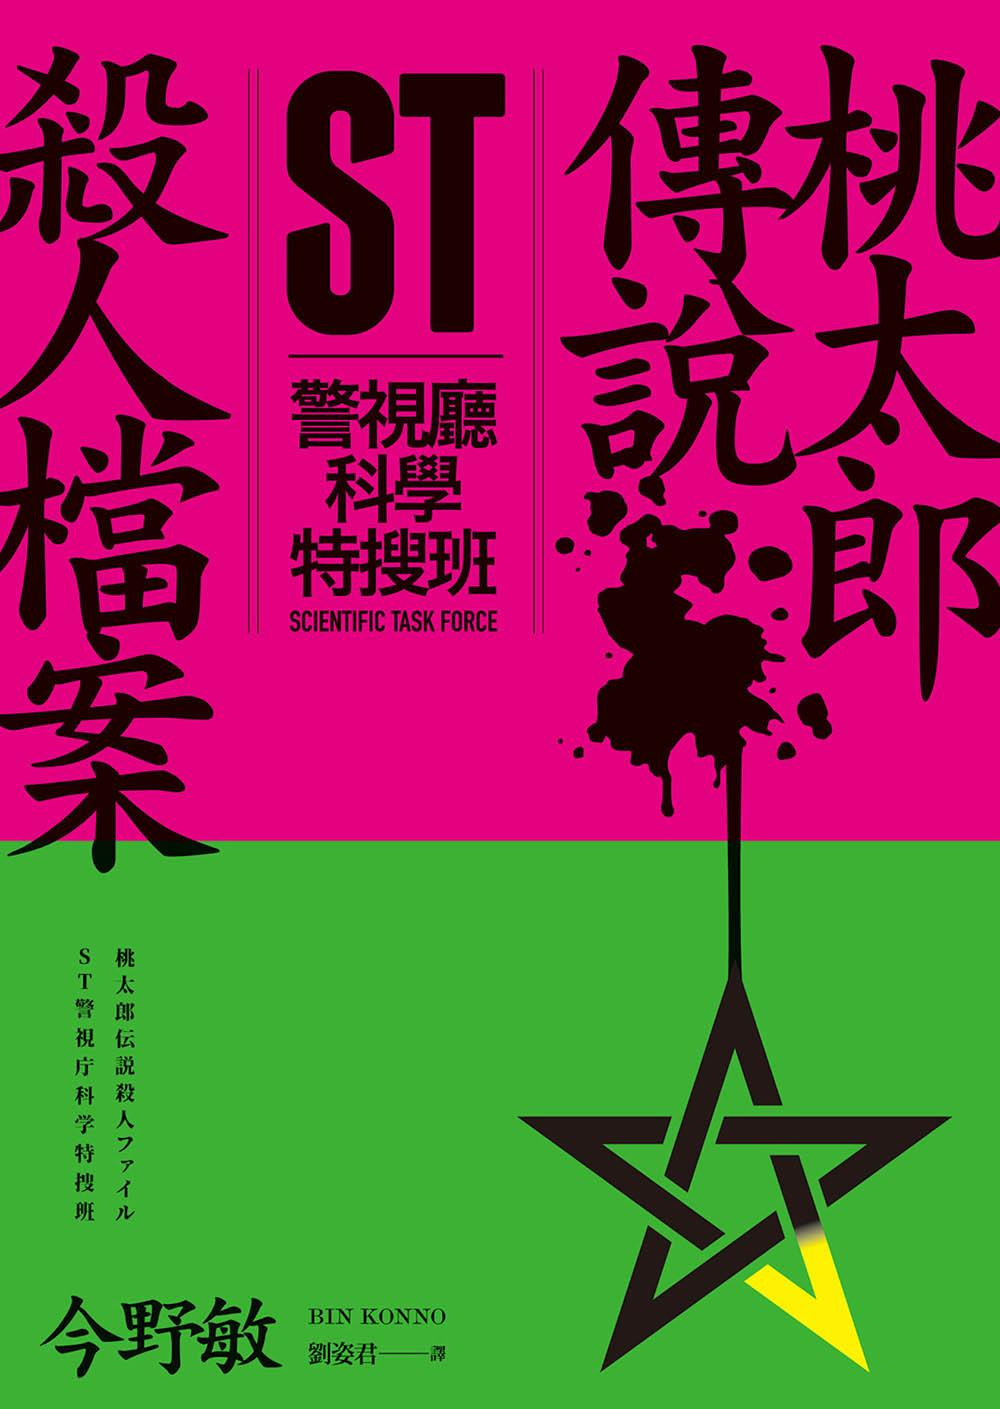 ST警視廳科學特搜班:桃太郎傳說殺人檔案